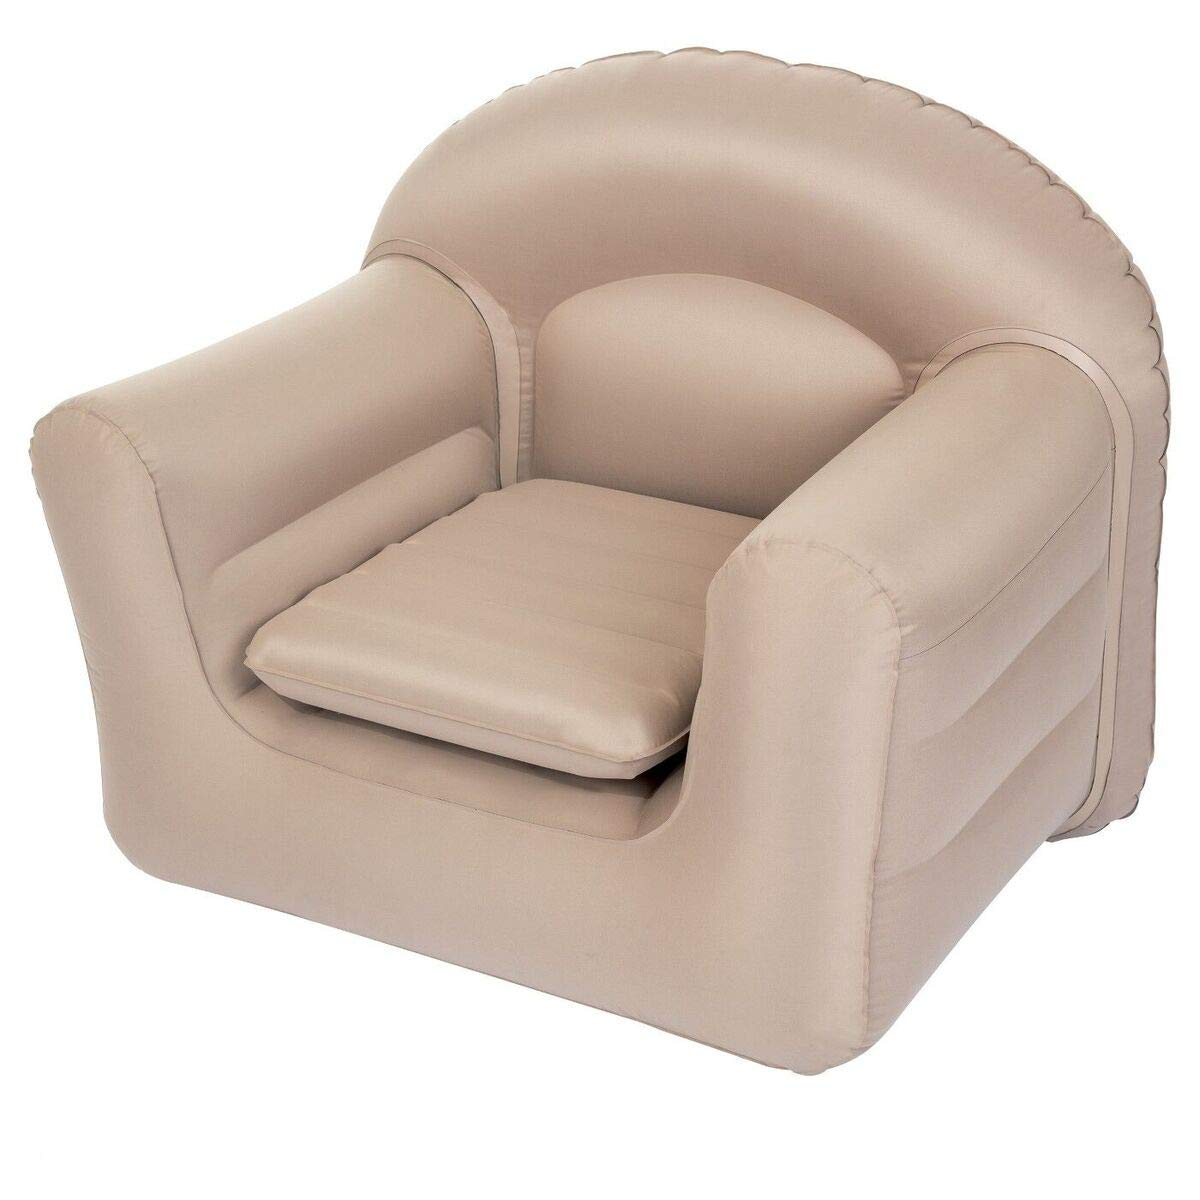 Amazon.com: Bestway Fortech - Sillón hinchable para sofá ...